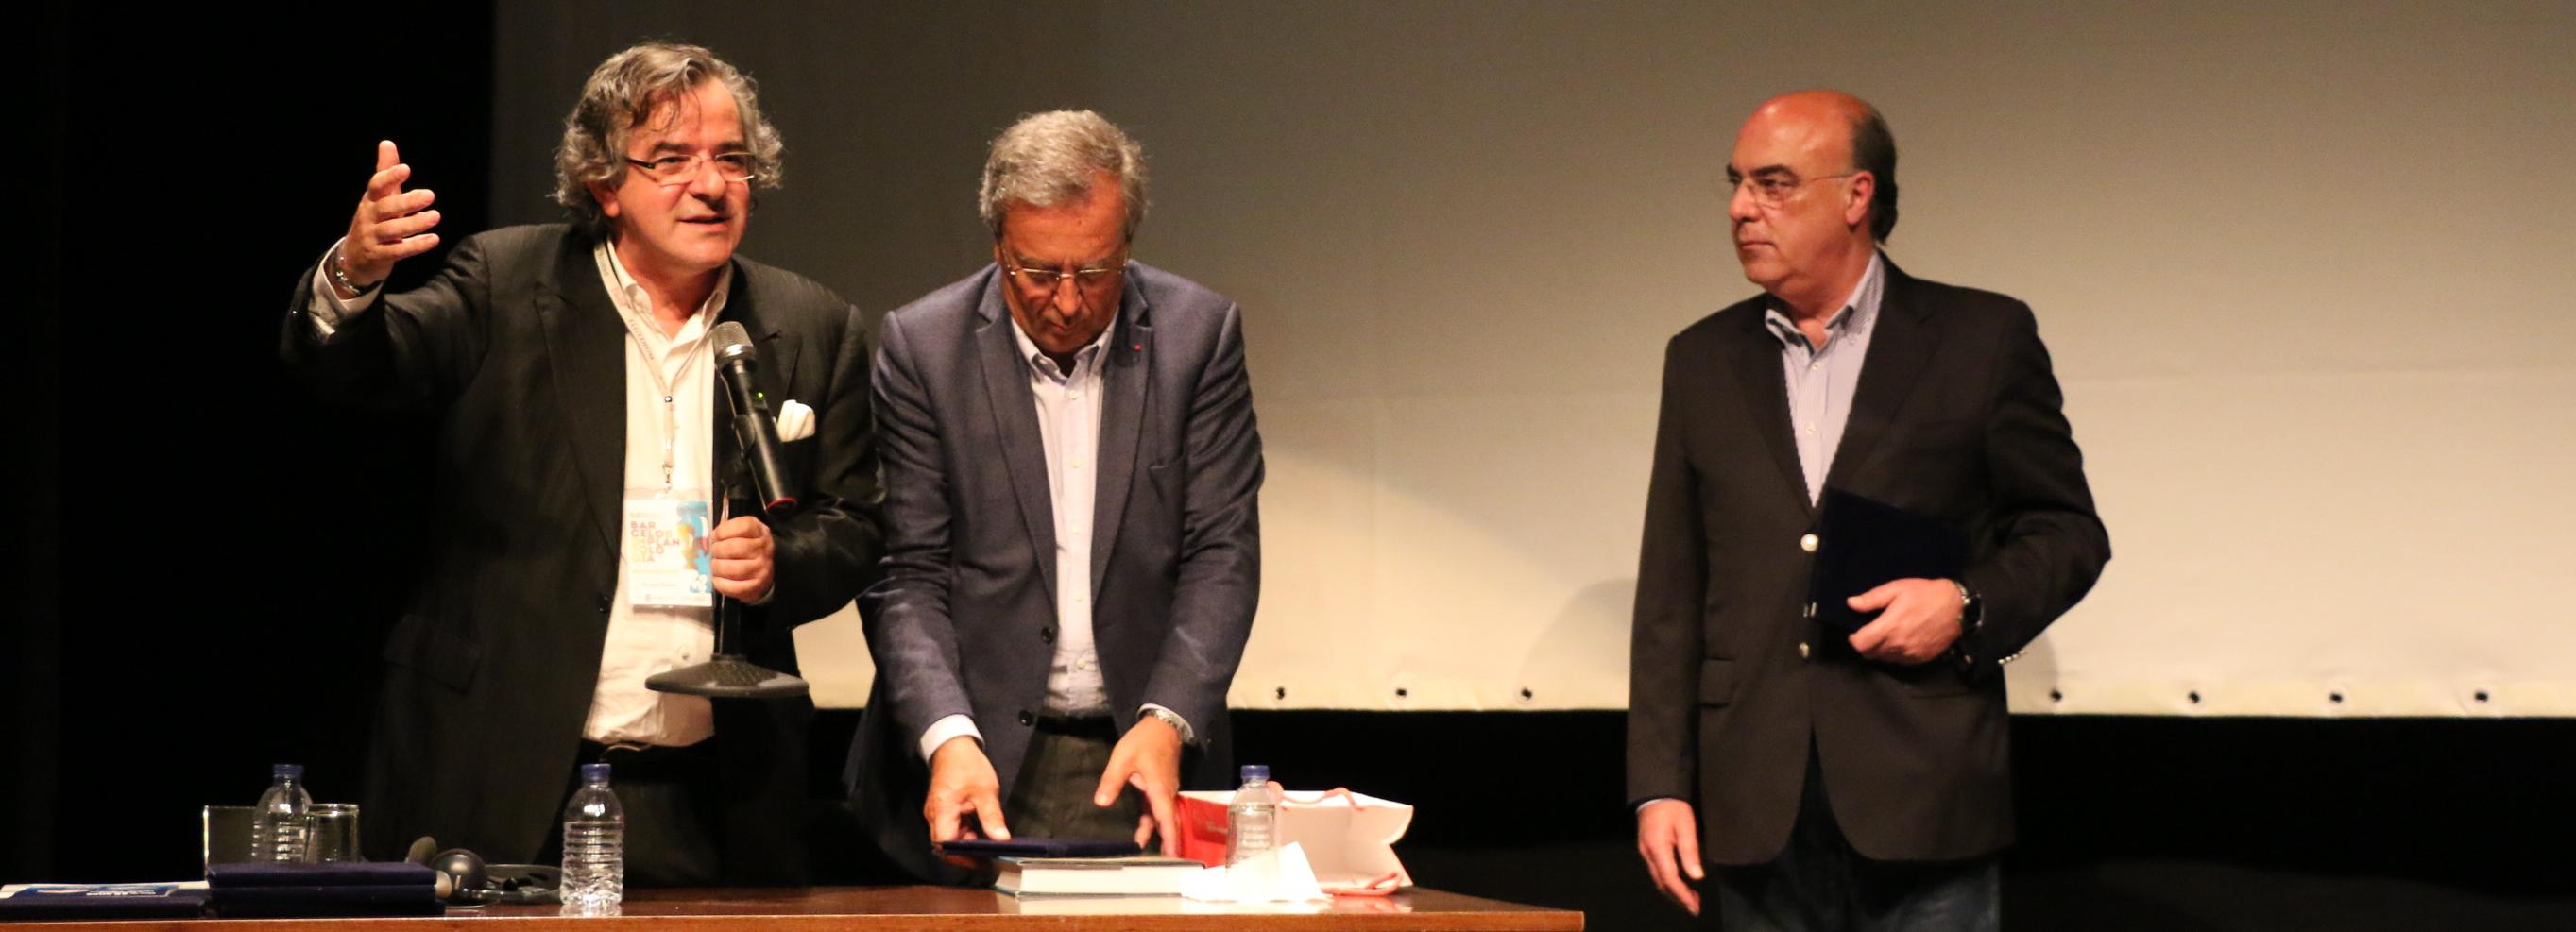 Teatro Gil Vicente recebeu simpósio sobre implantologia